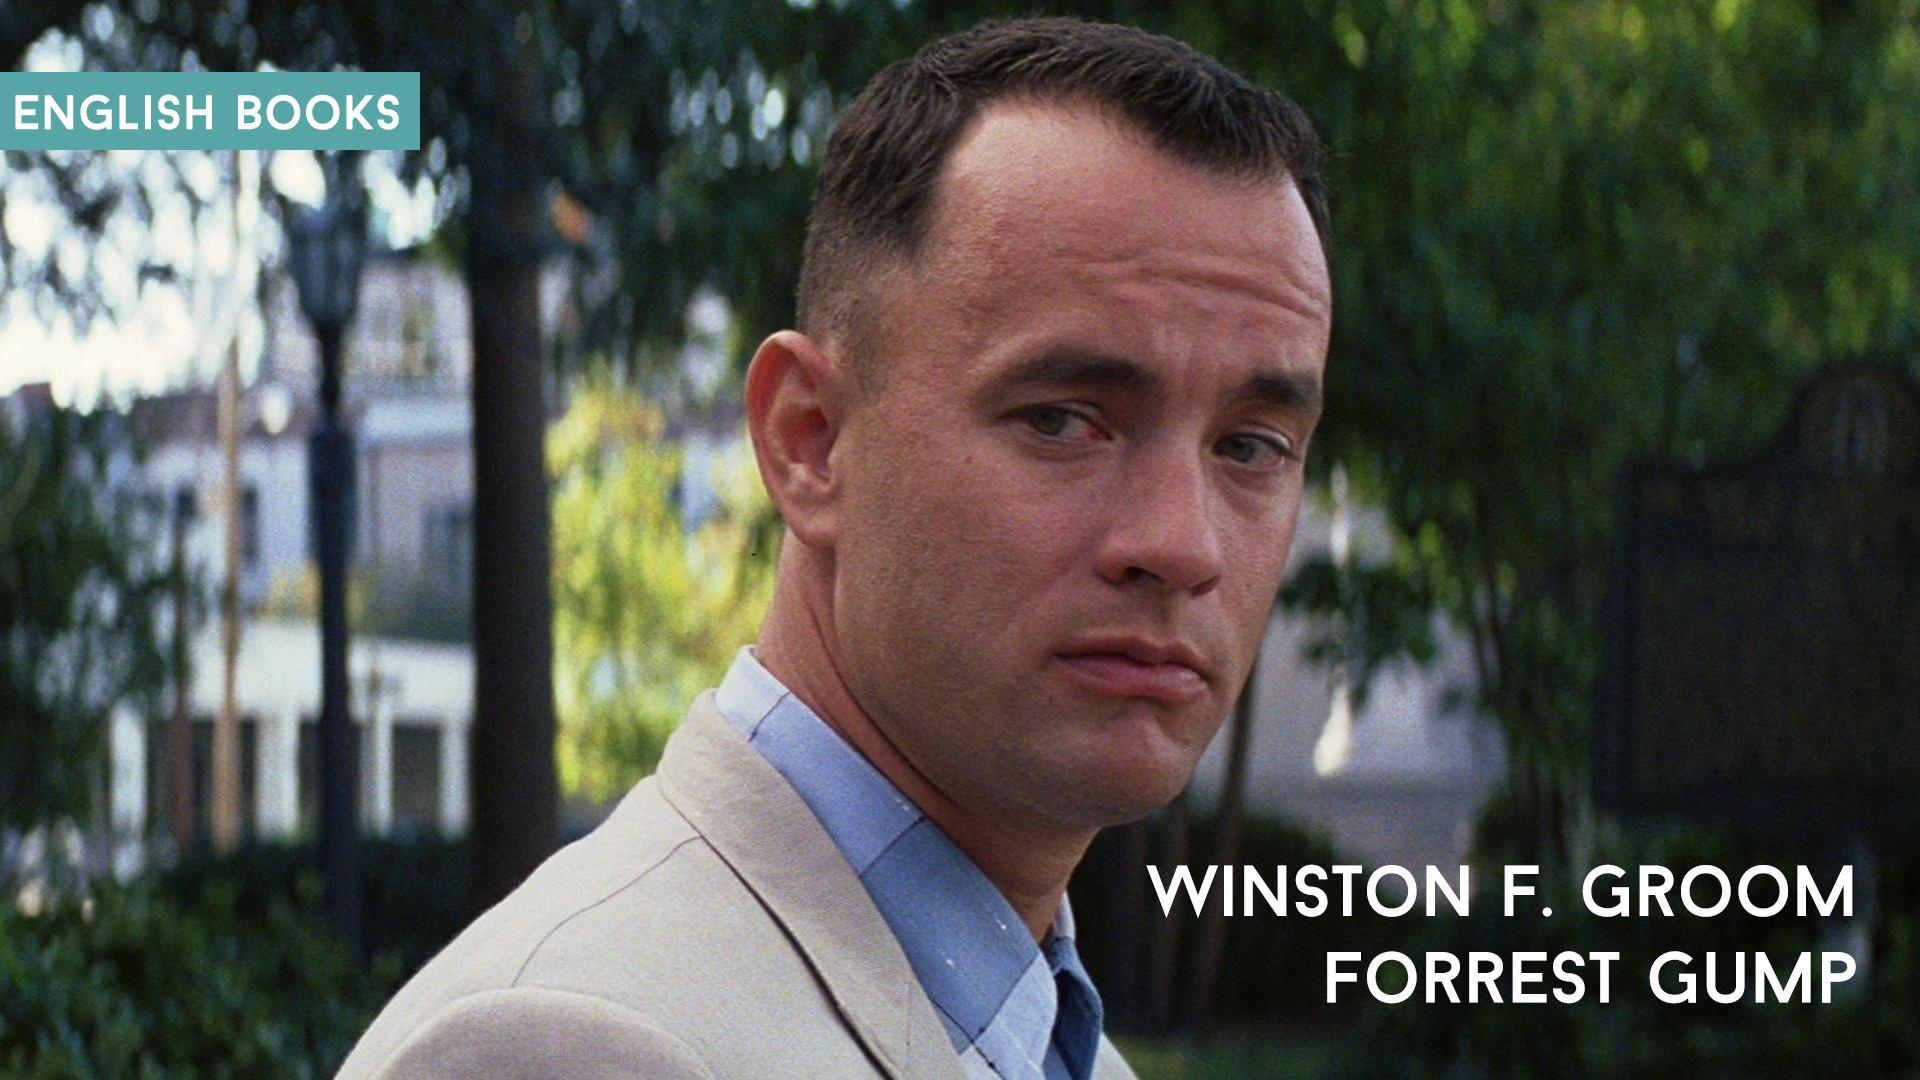 Winston F